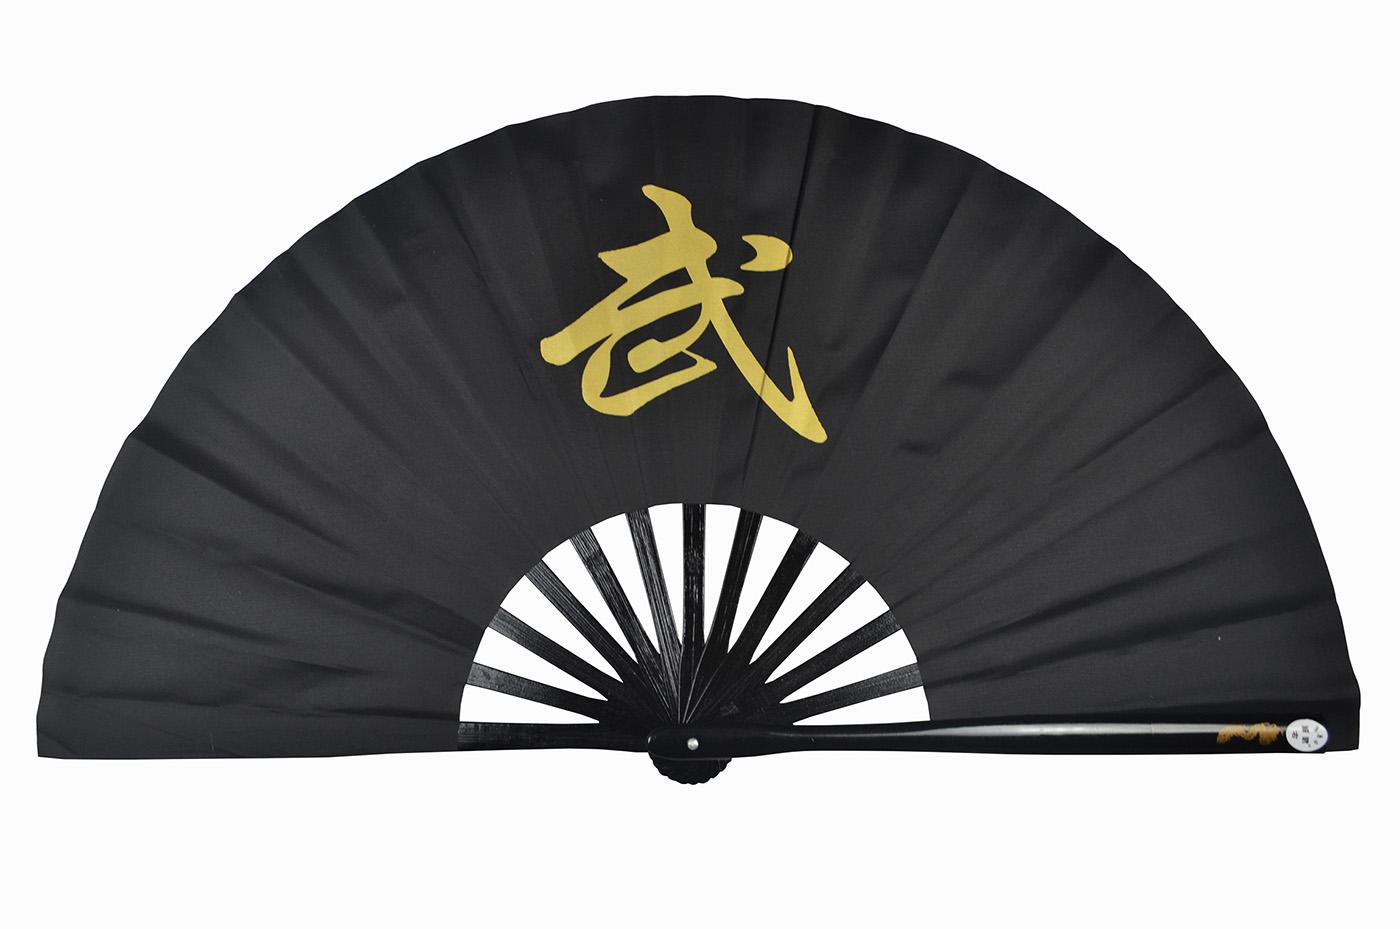 tai chi fan tai ji shan wu chinatown shop. Black Bedroom Furniture Sets. Home Design Ideas